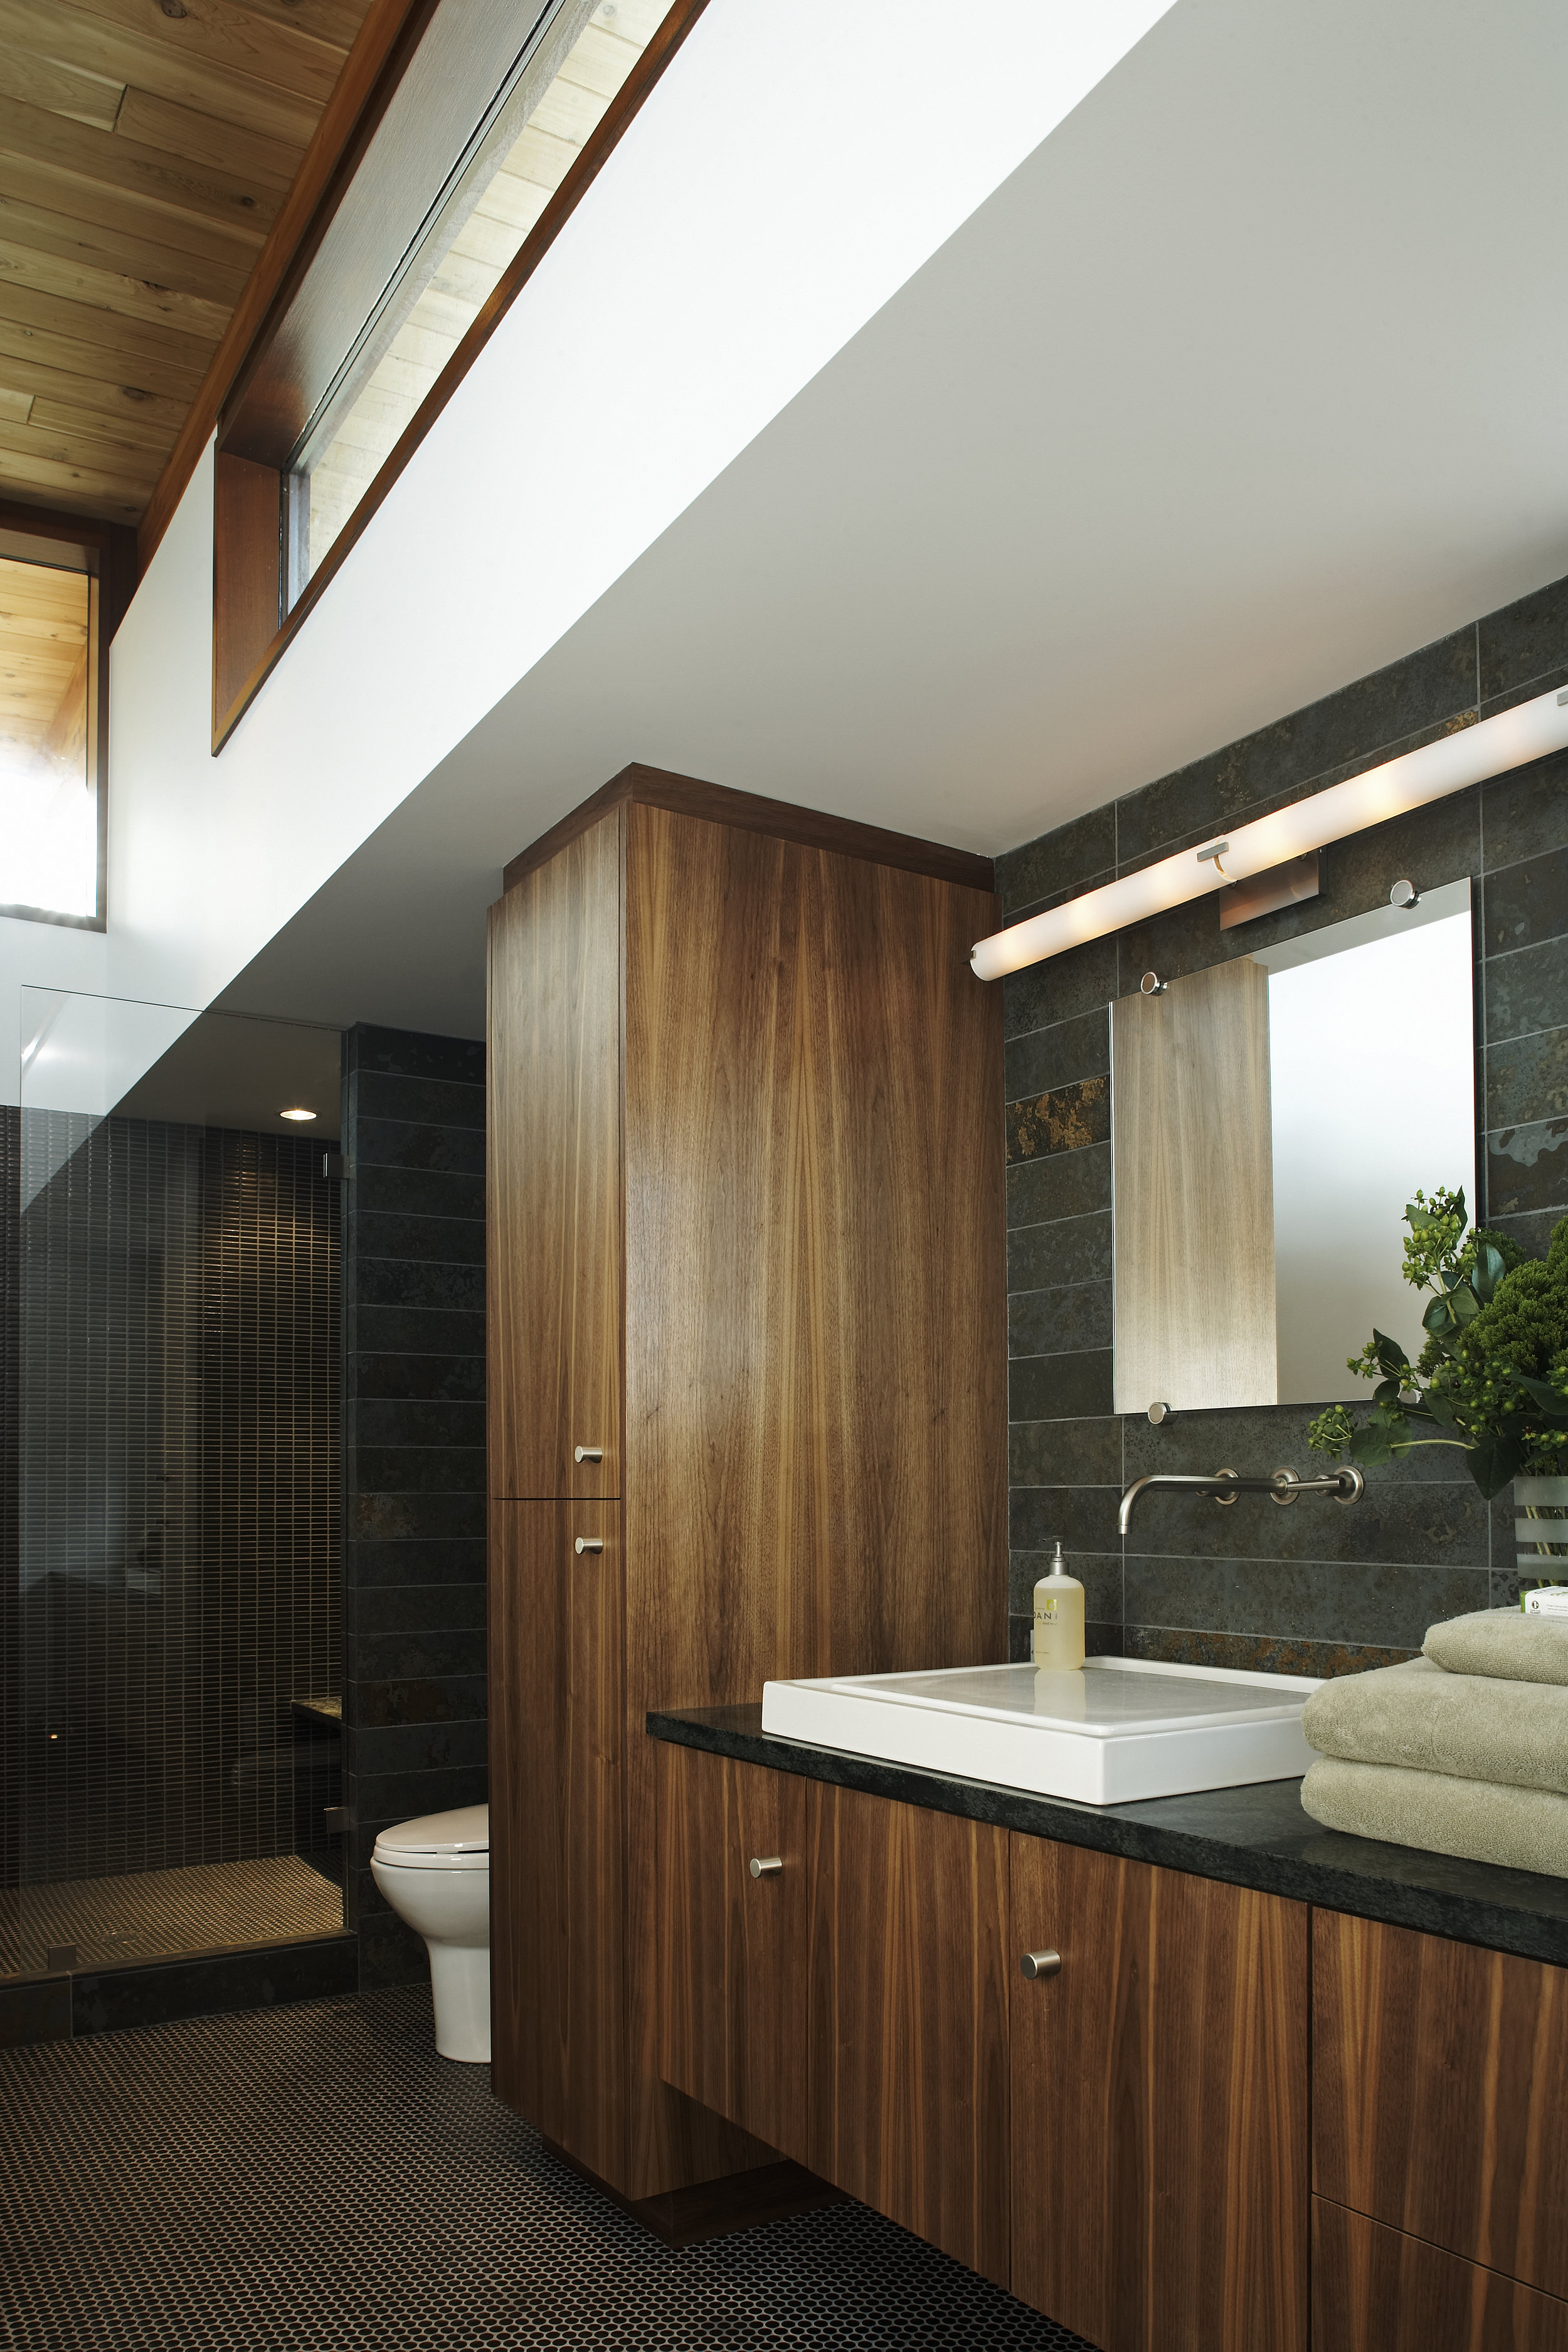 turkel_modern_design_prefab_serenbe_bathroom.jpg